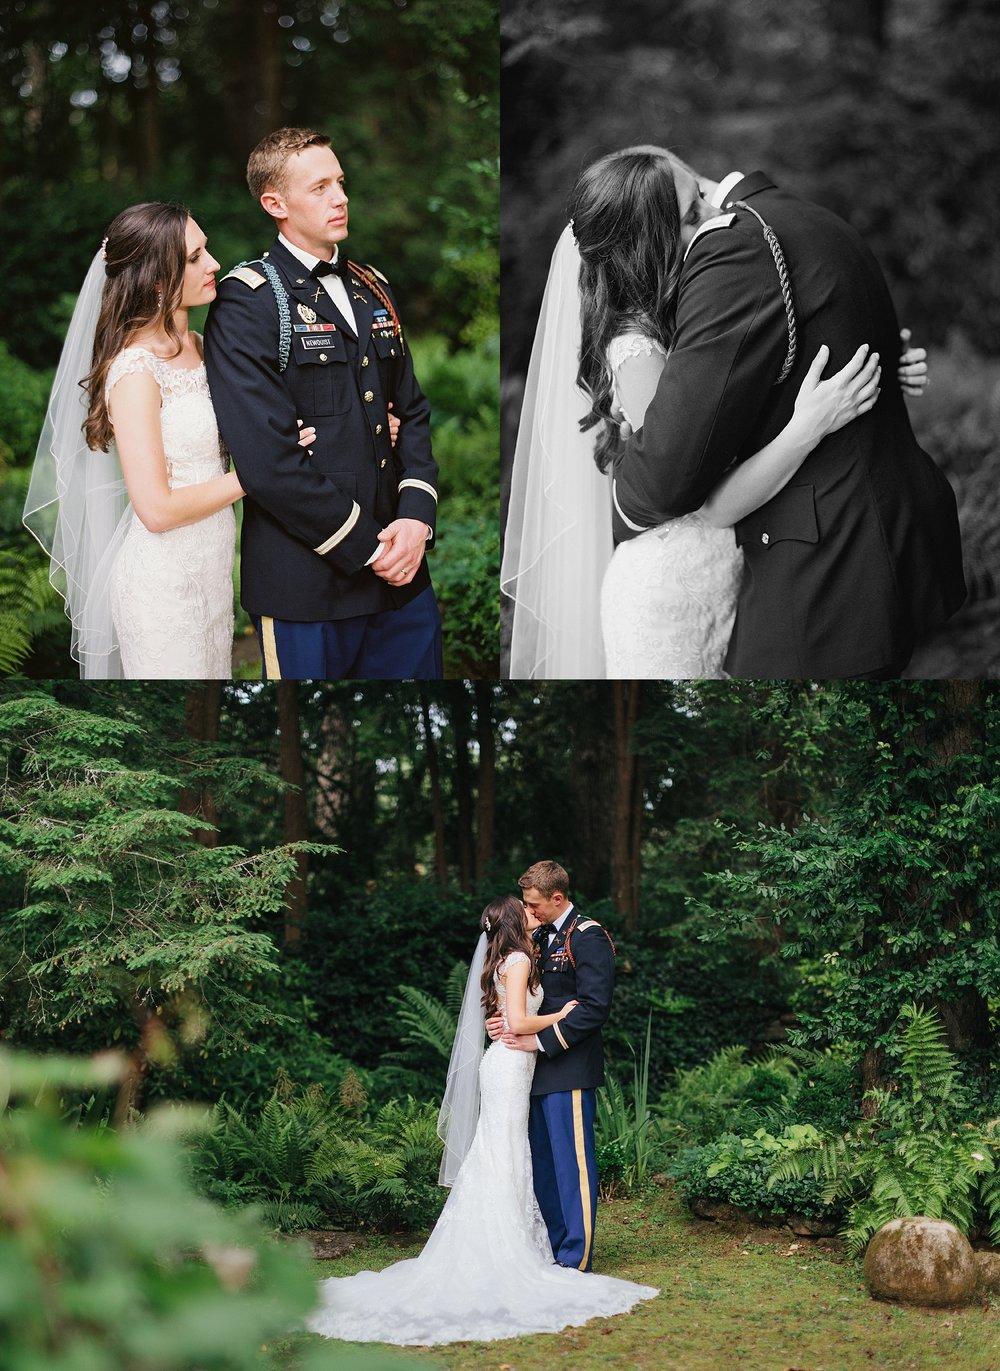 203-dunaway-gardens-newquist-wedding-009692-R1-016.jpg